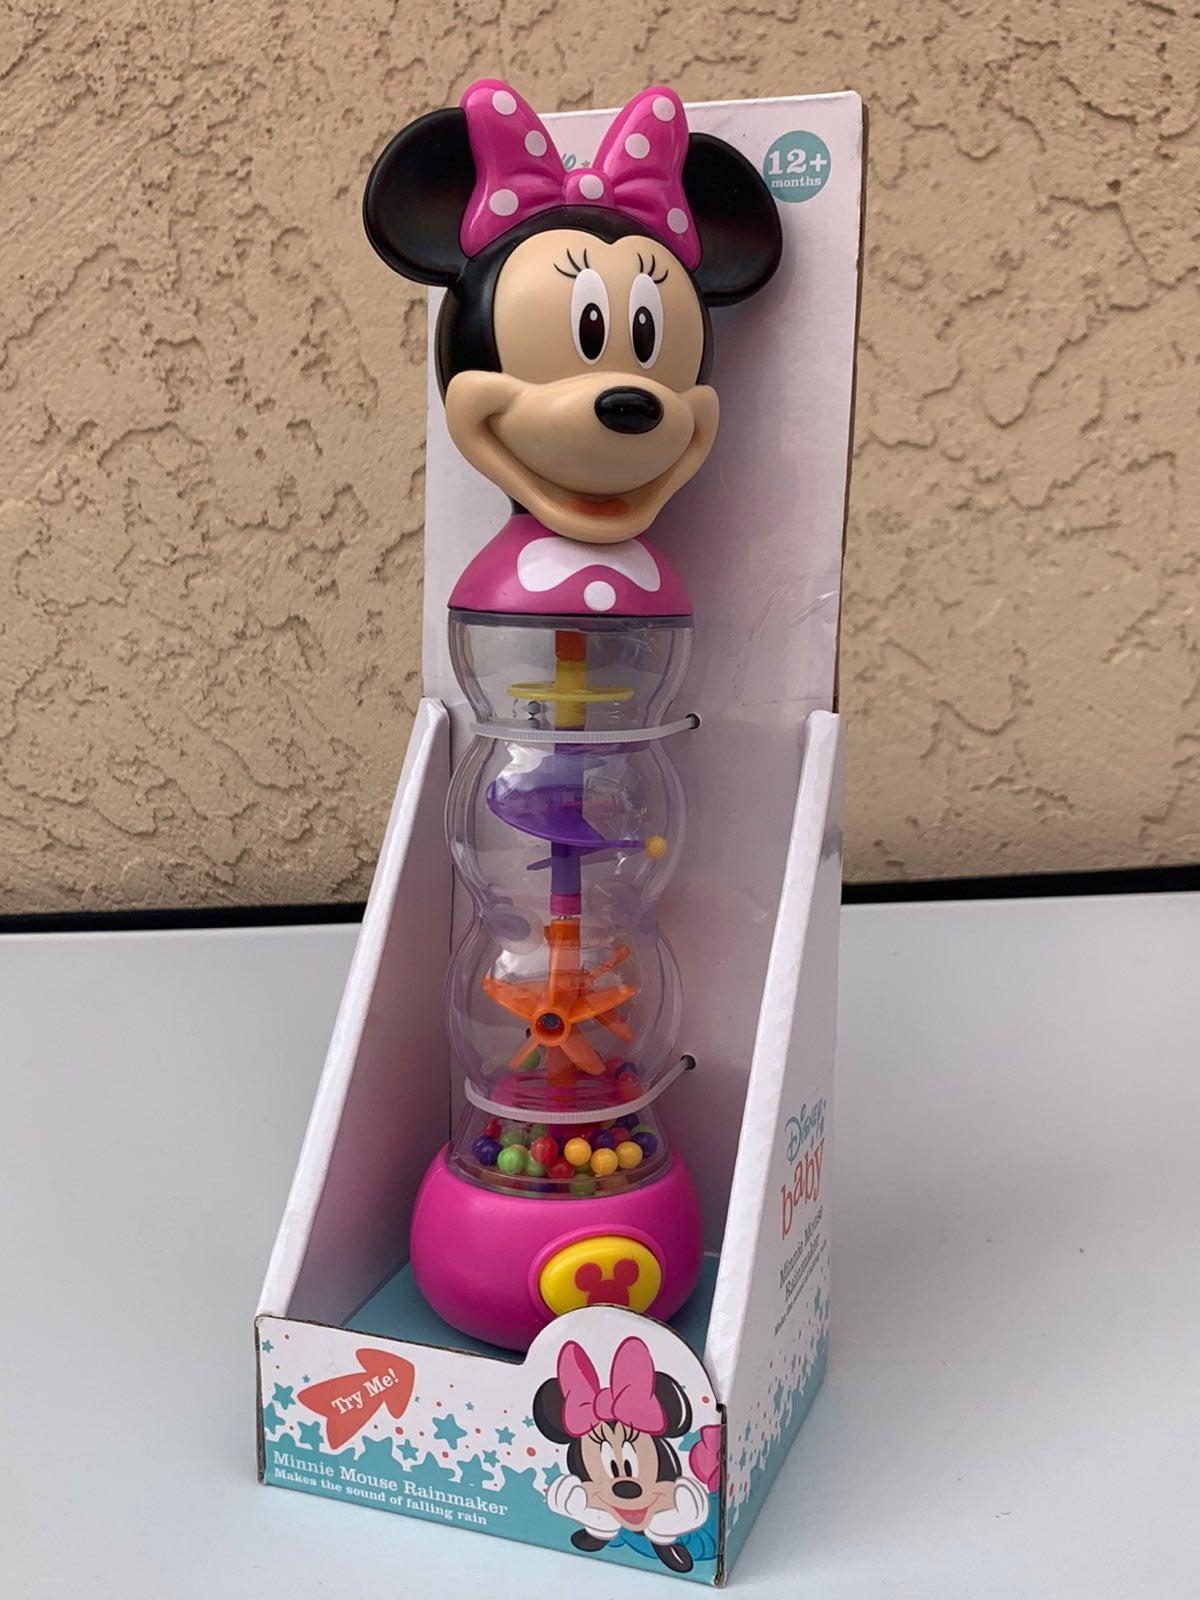 Disney Minnie mouse rain maker toy NEW